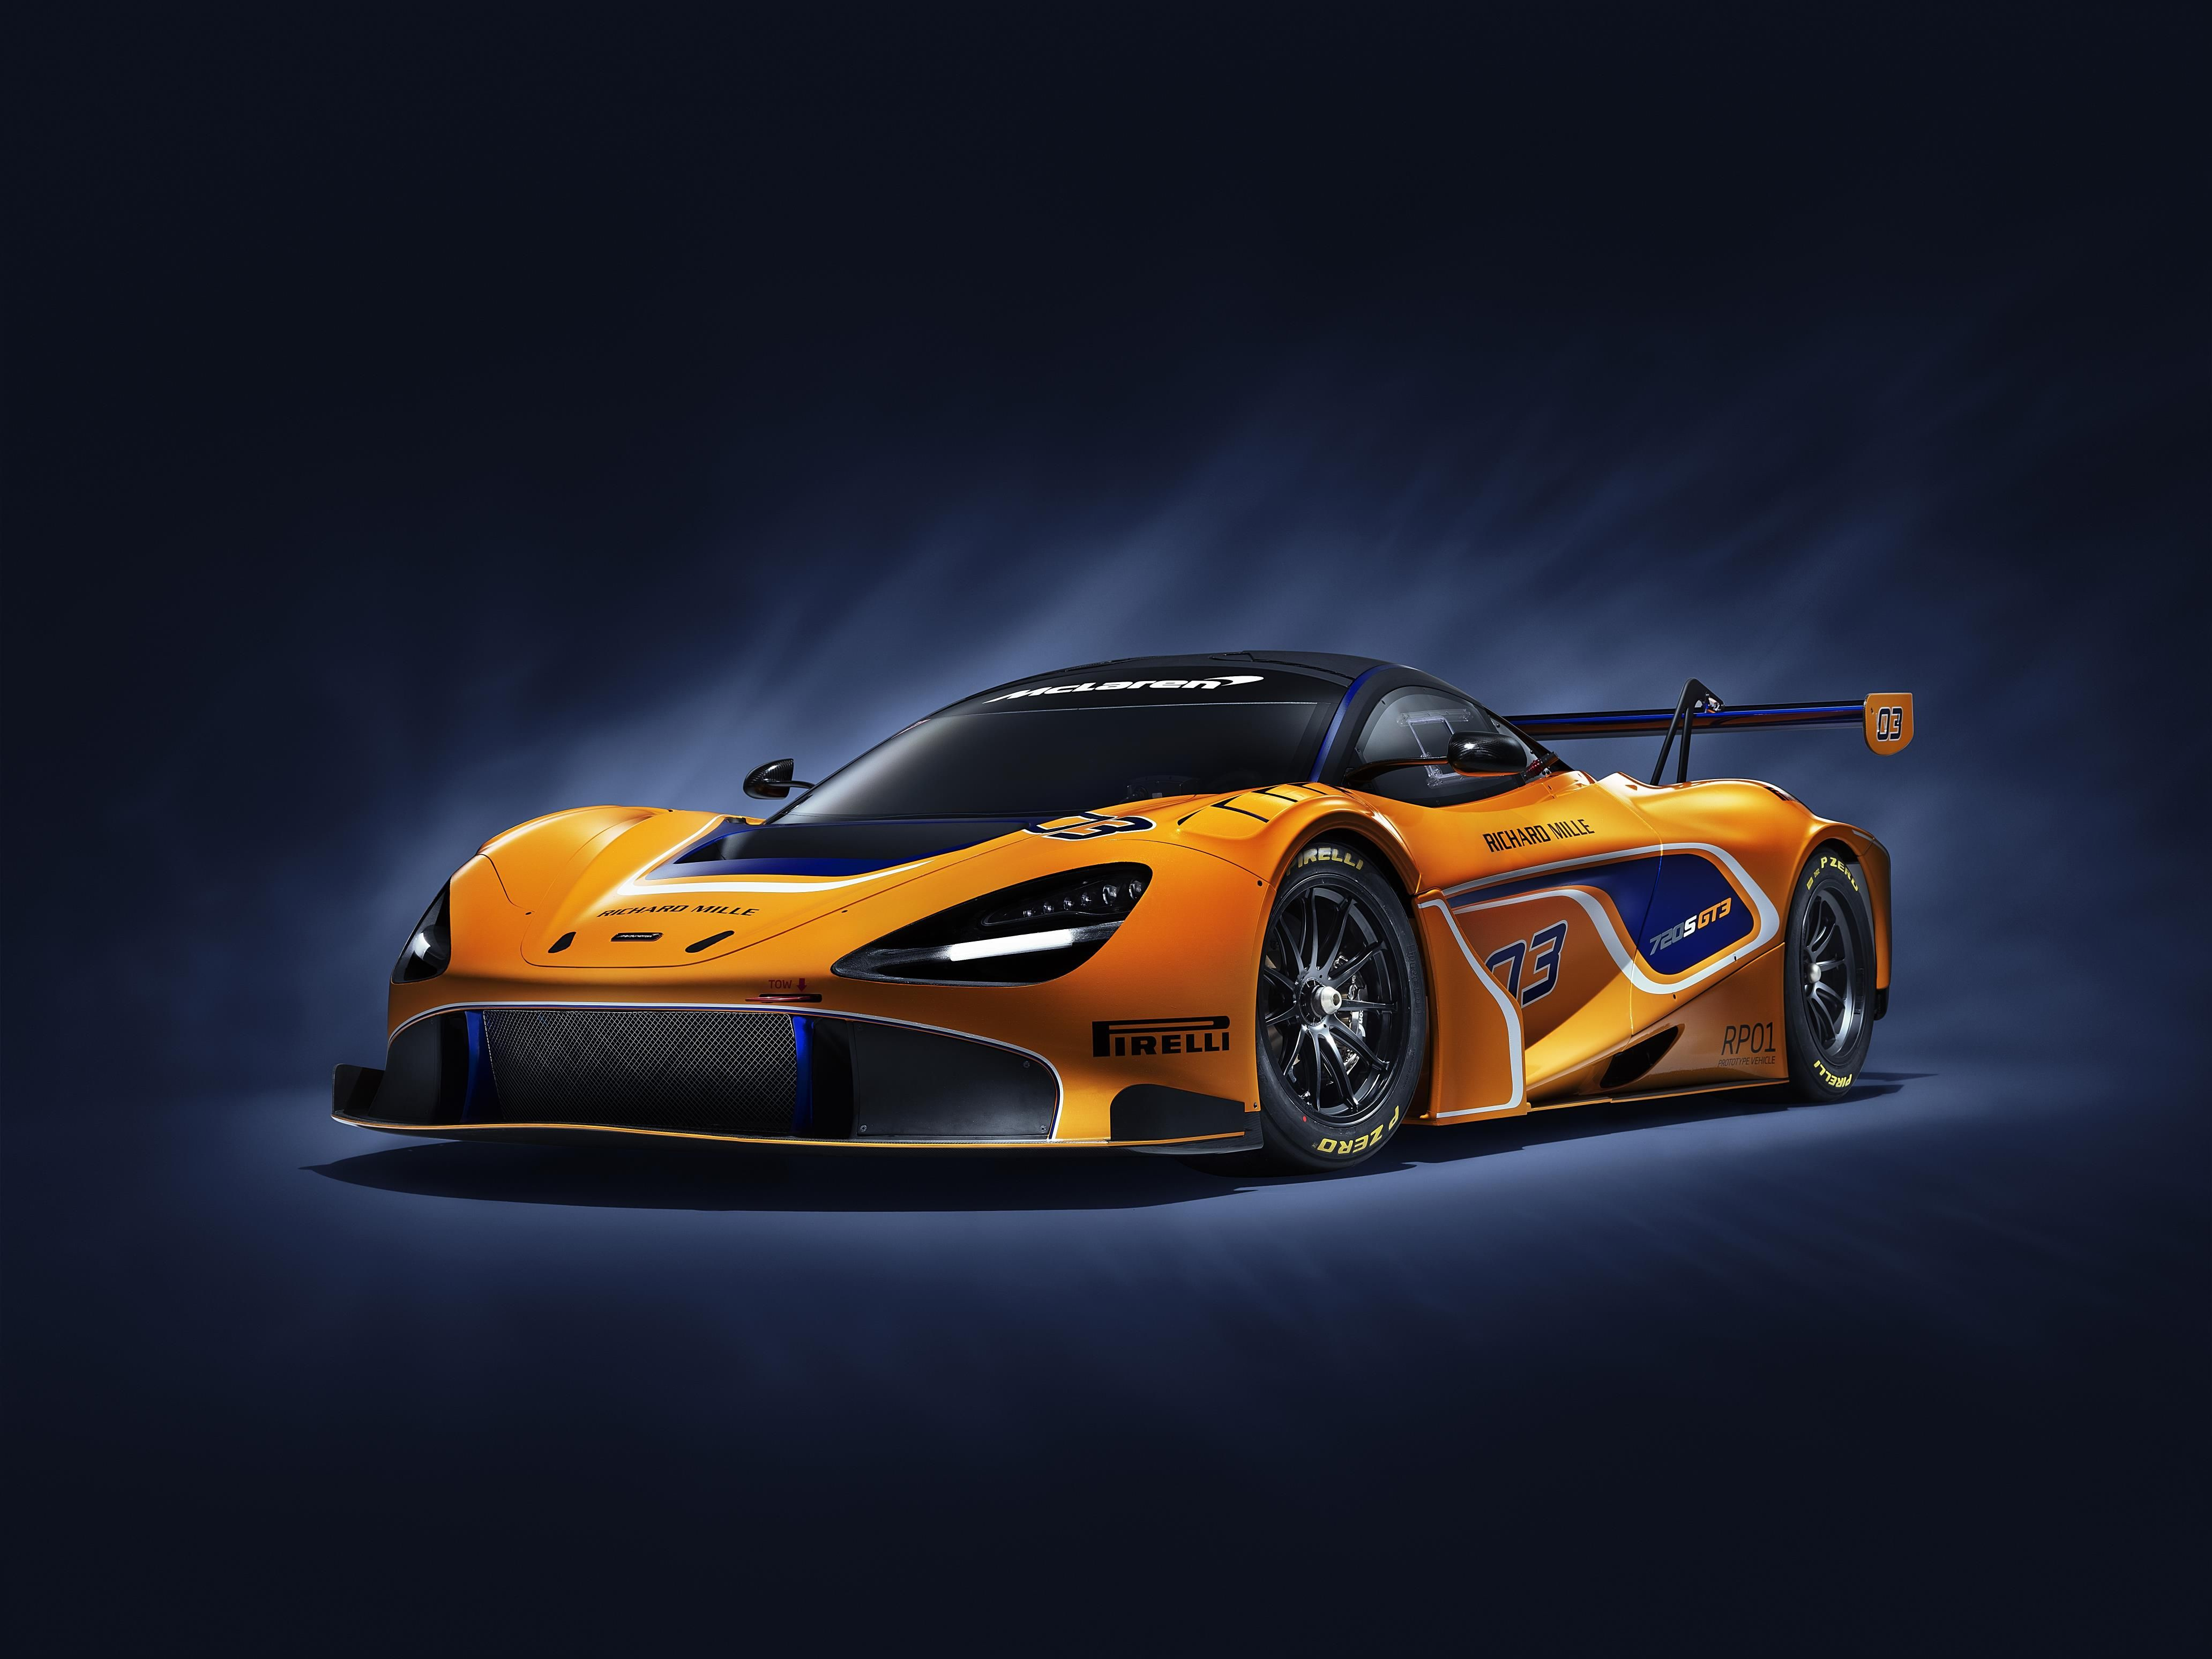 Mclaren 720s Gt3 Best Luxury Sports Car Sports Car New Sports Cars